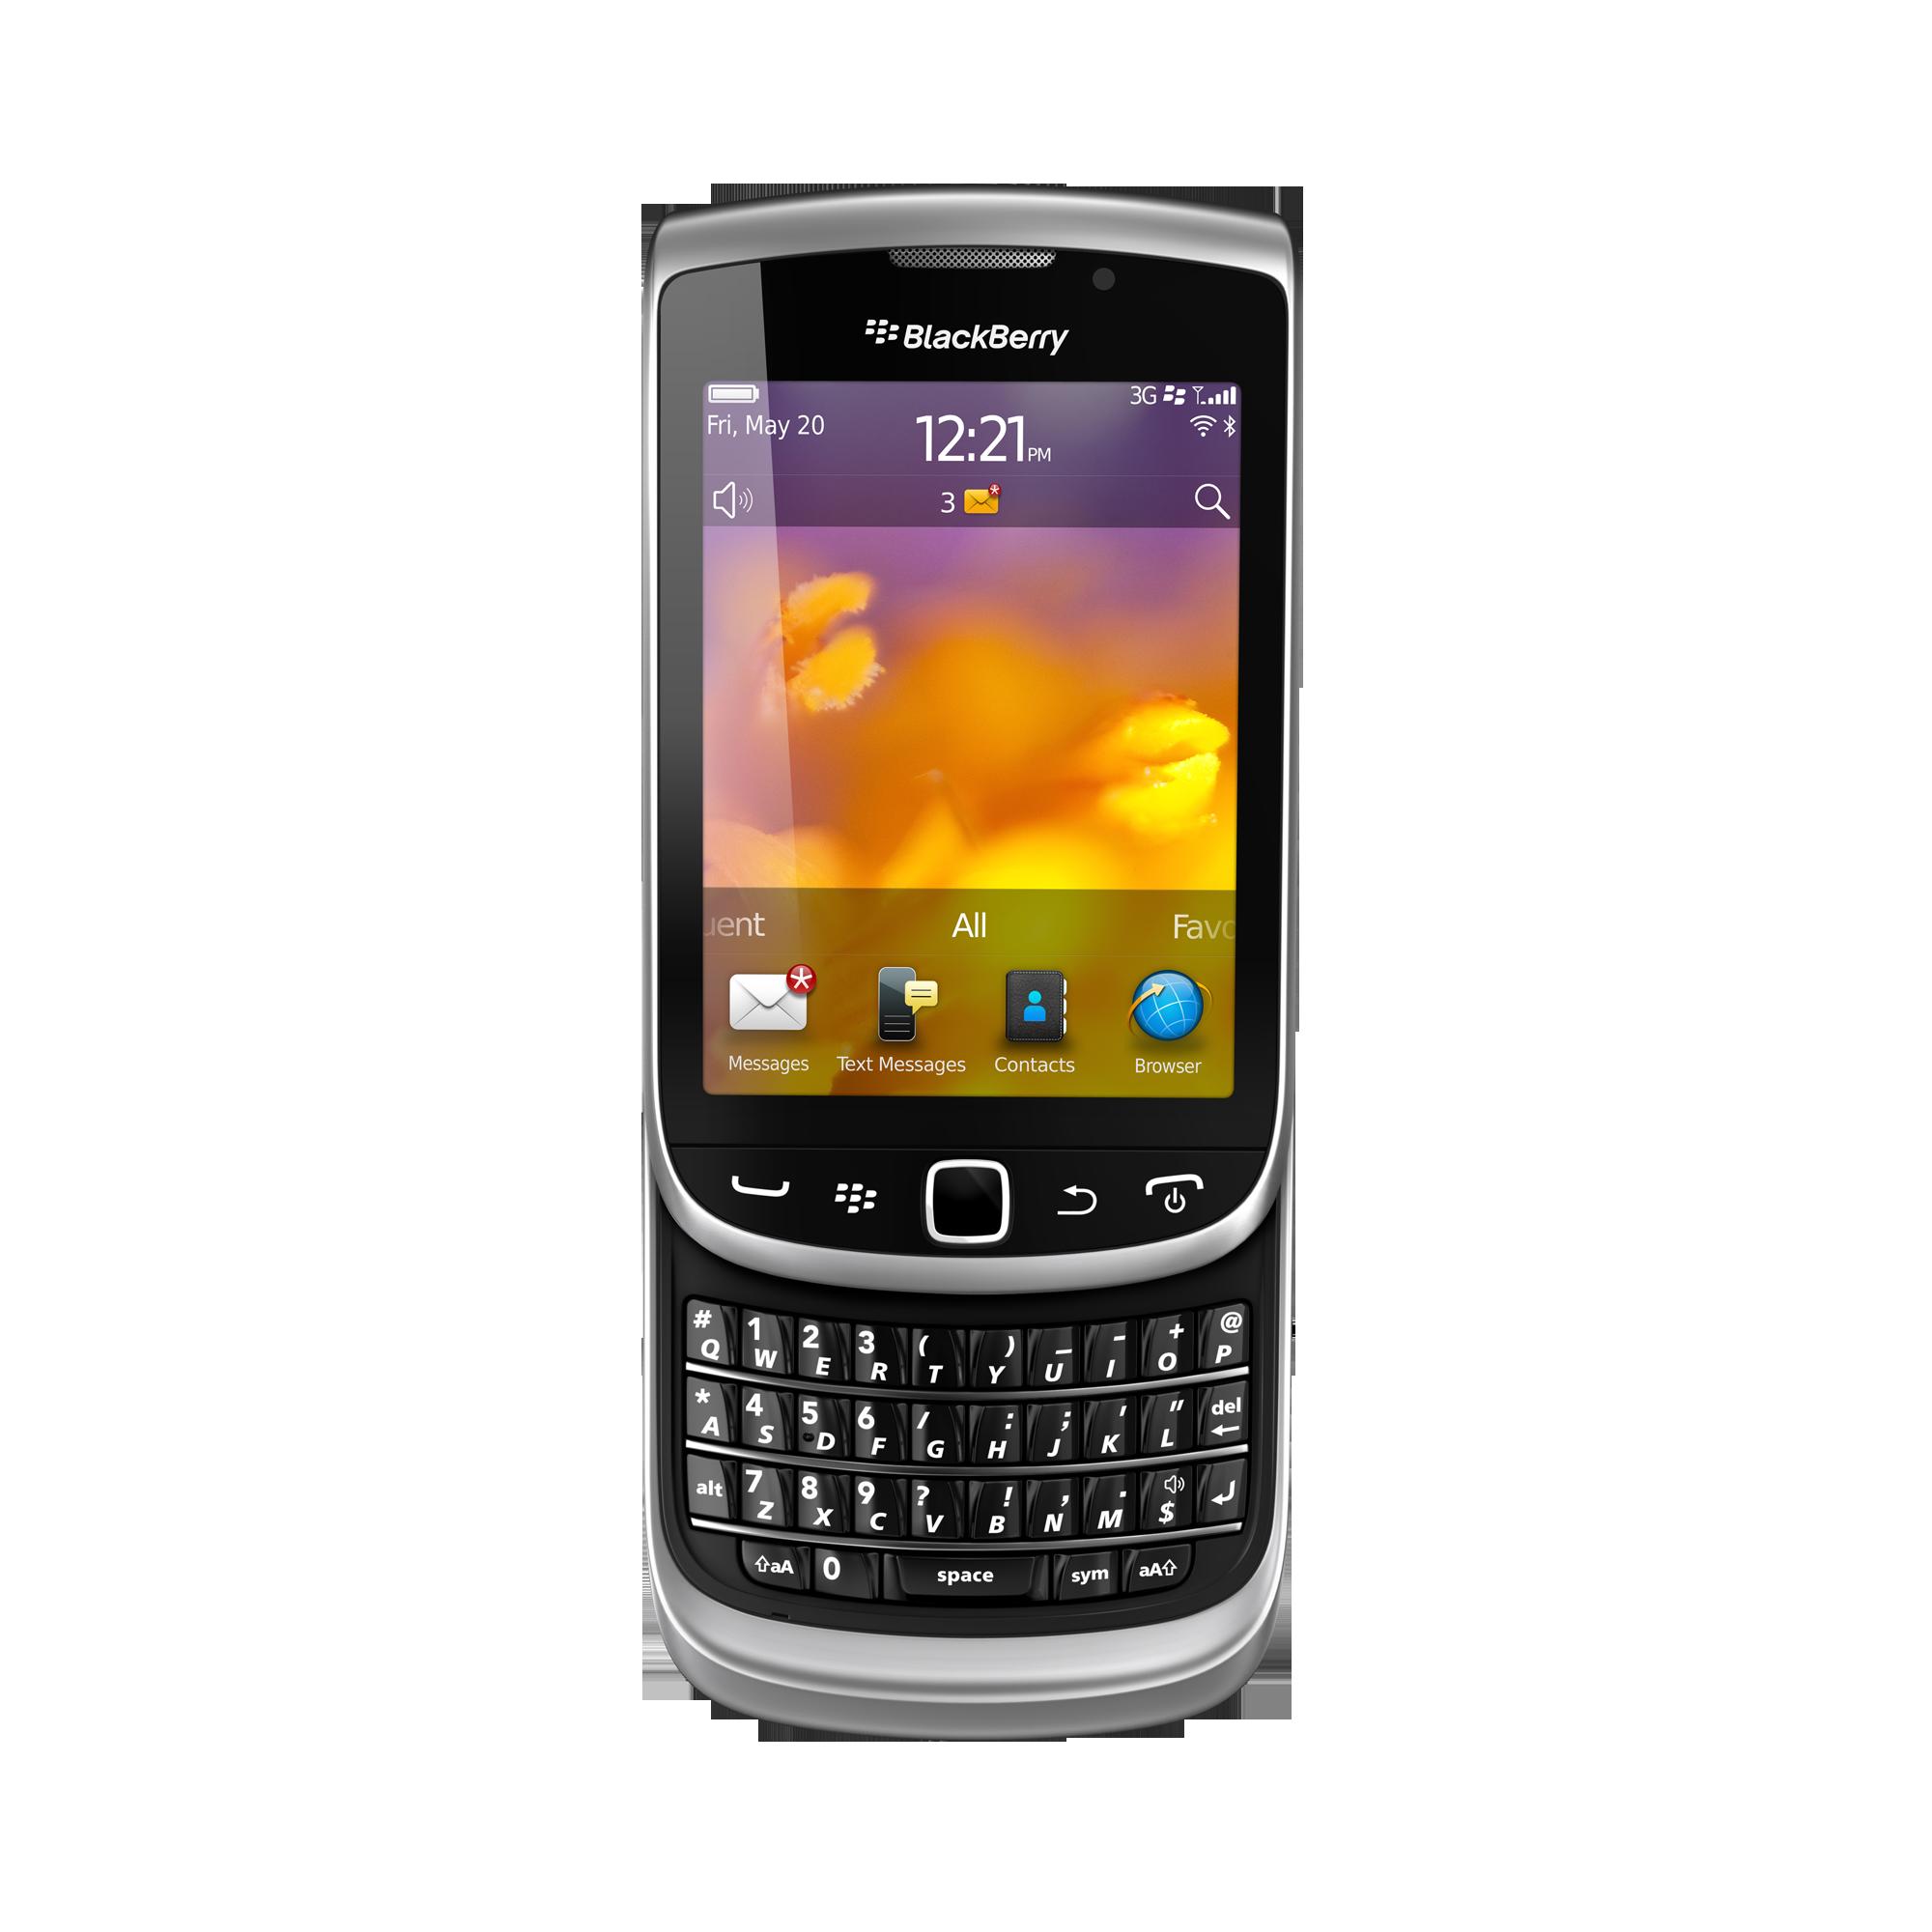 instagram sign up for blackberry torch